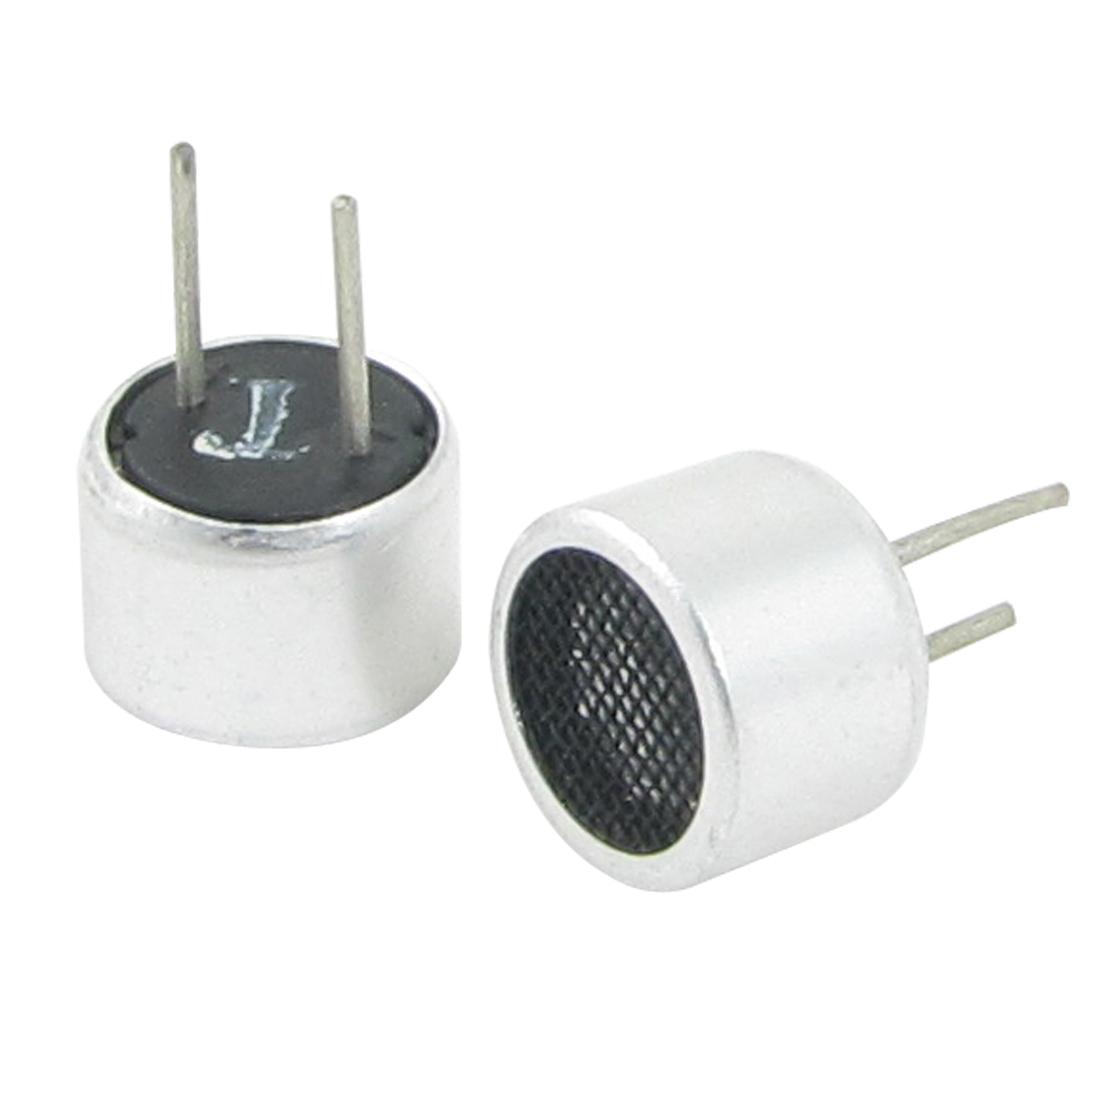 Pair Aluminum Housing 40KHz Ultrasonic Transducer Transmitter Receiver 9.8mm